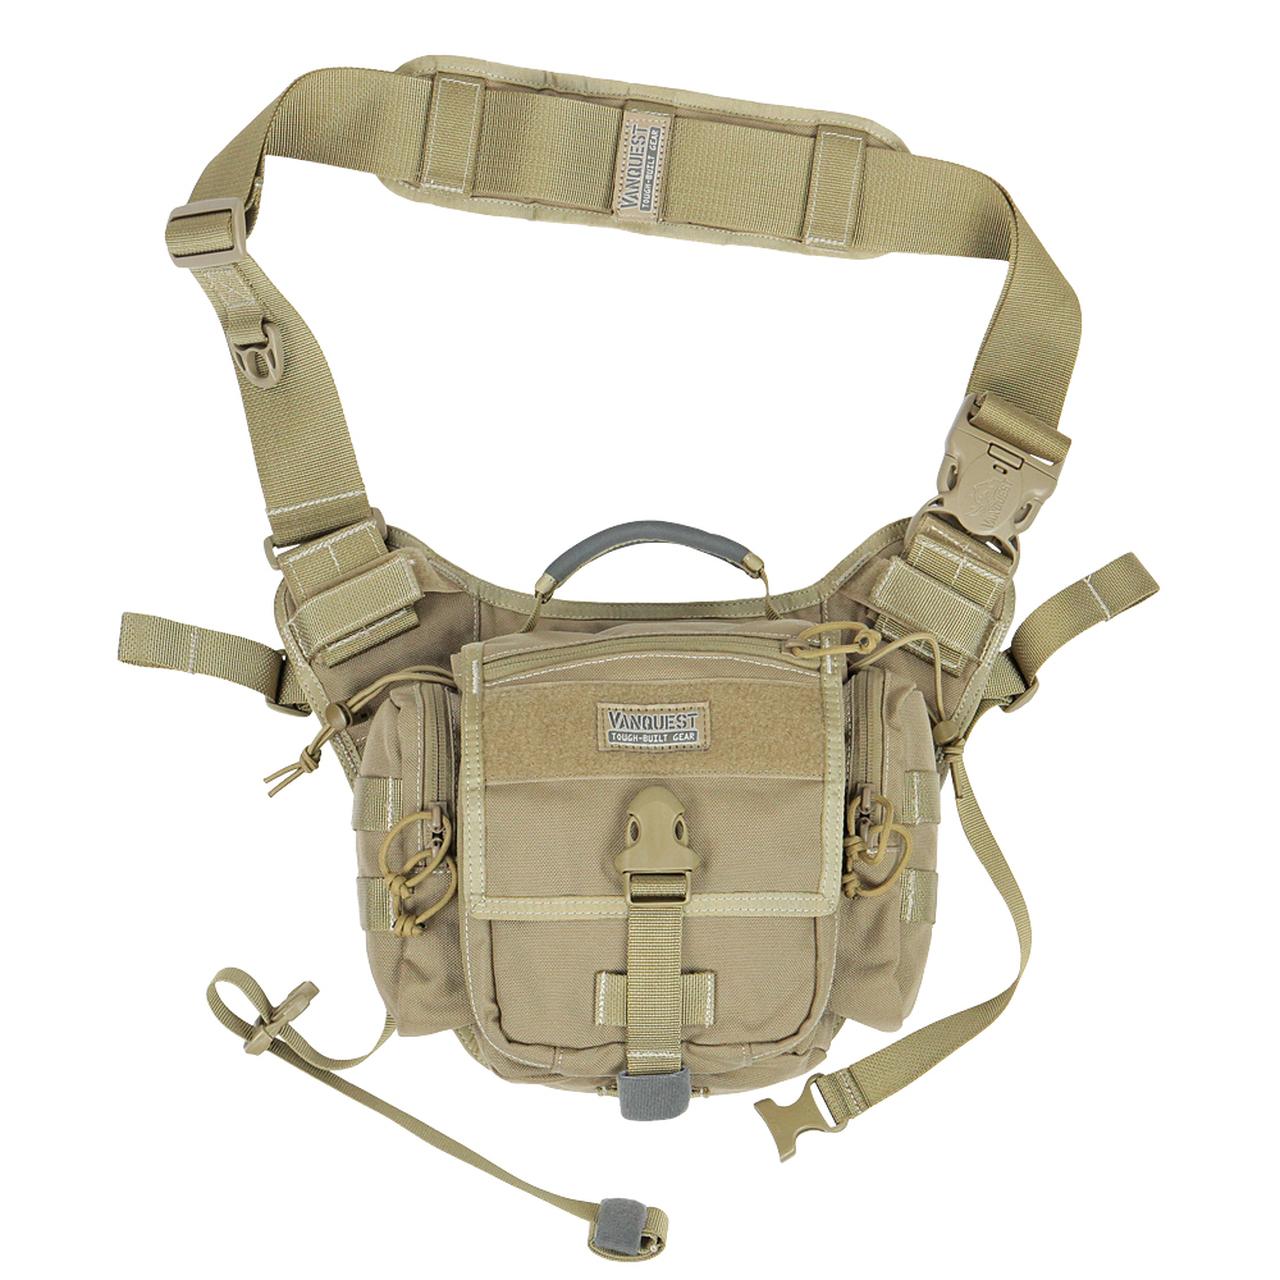 Túi VANQUEST TOLCAT 2.0 VPacker Gear Bag – Coyote Tan